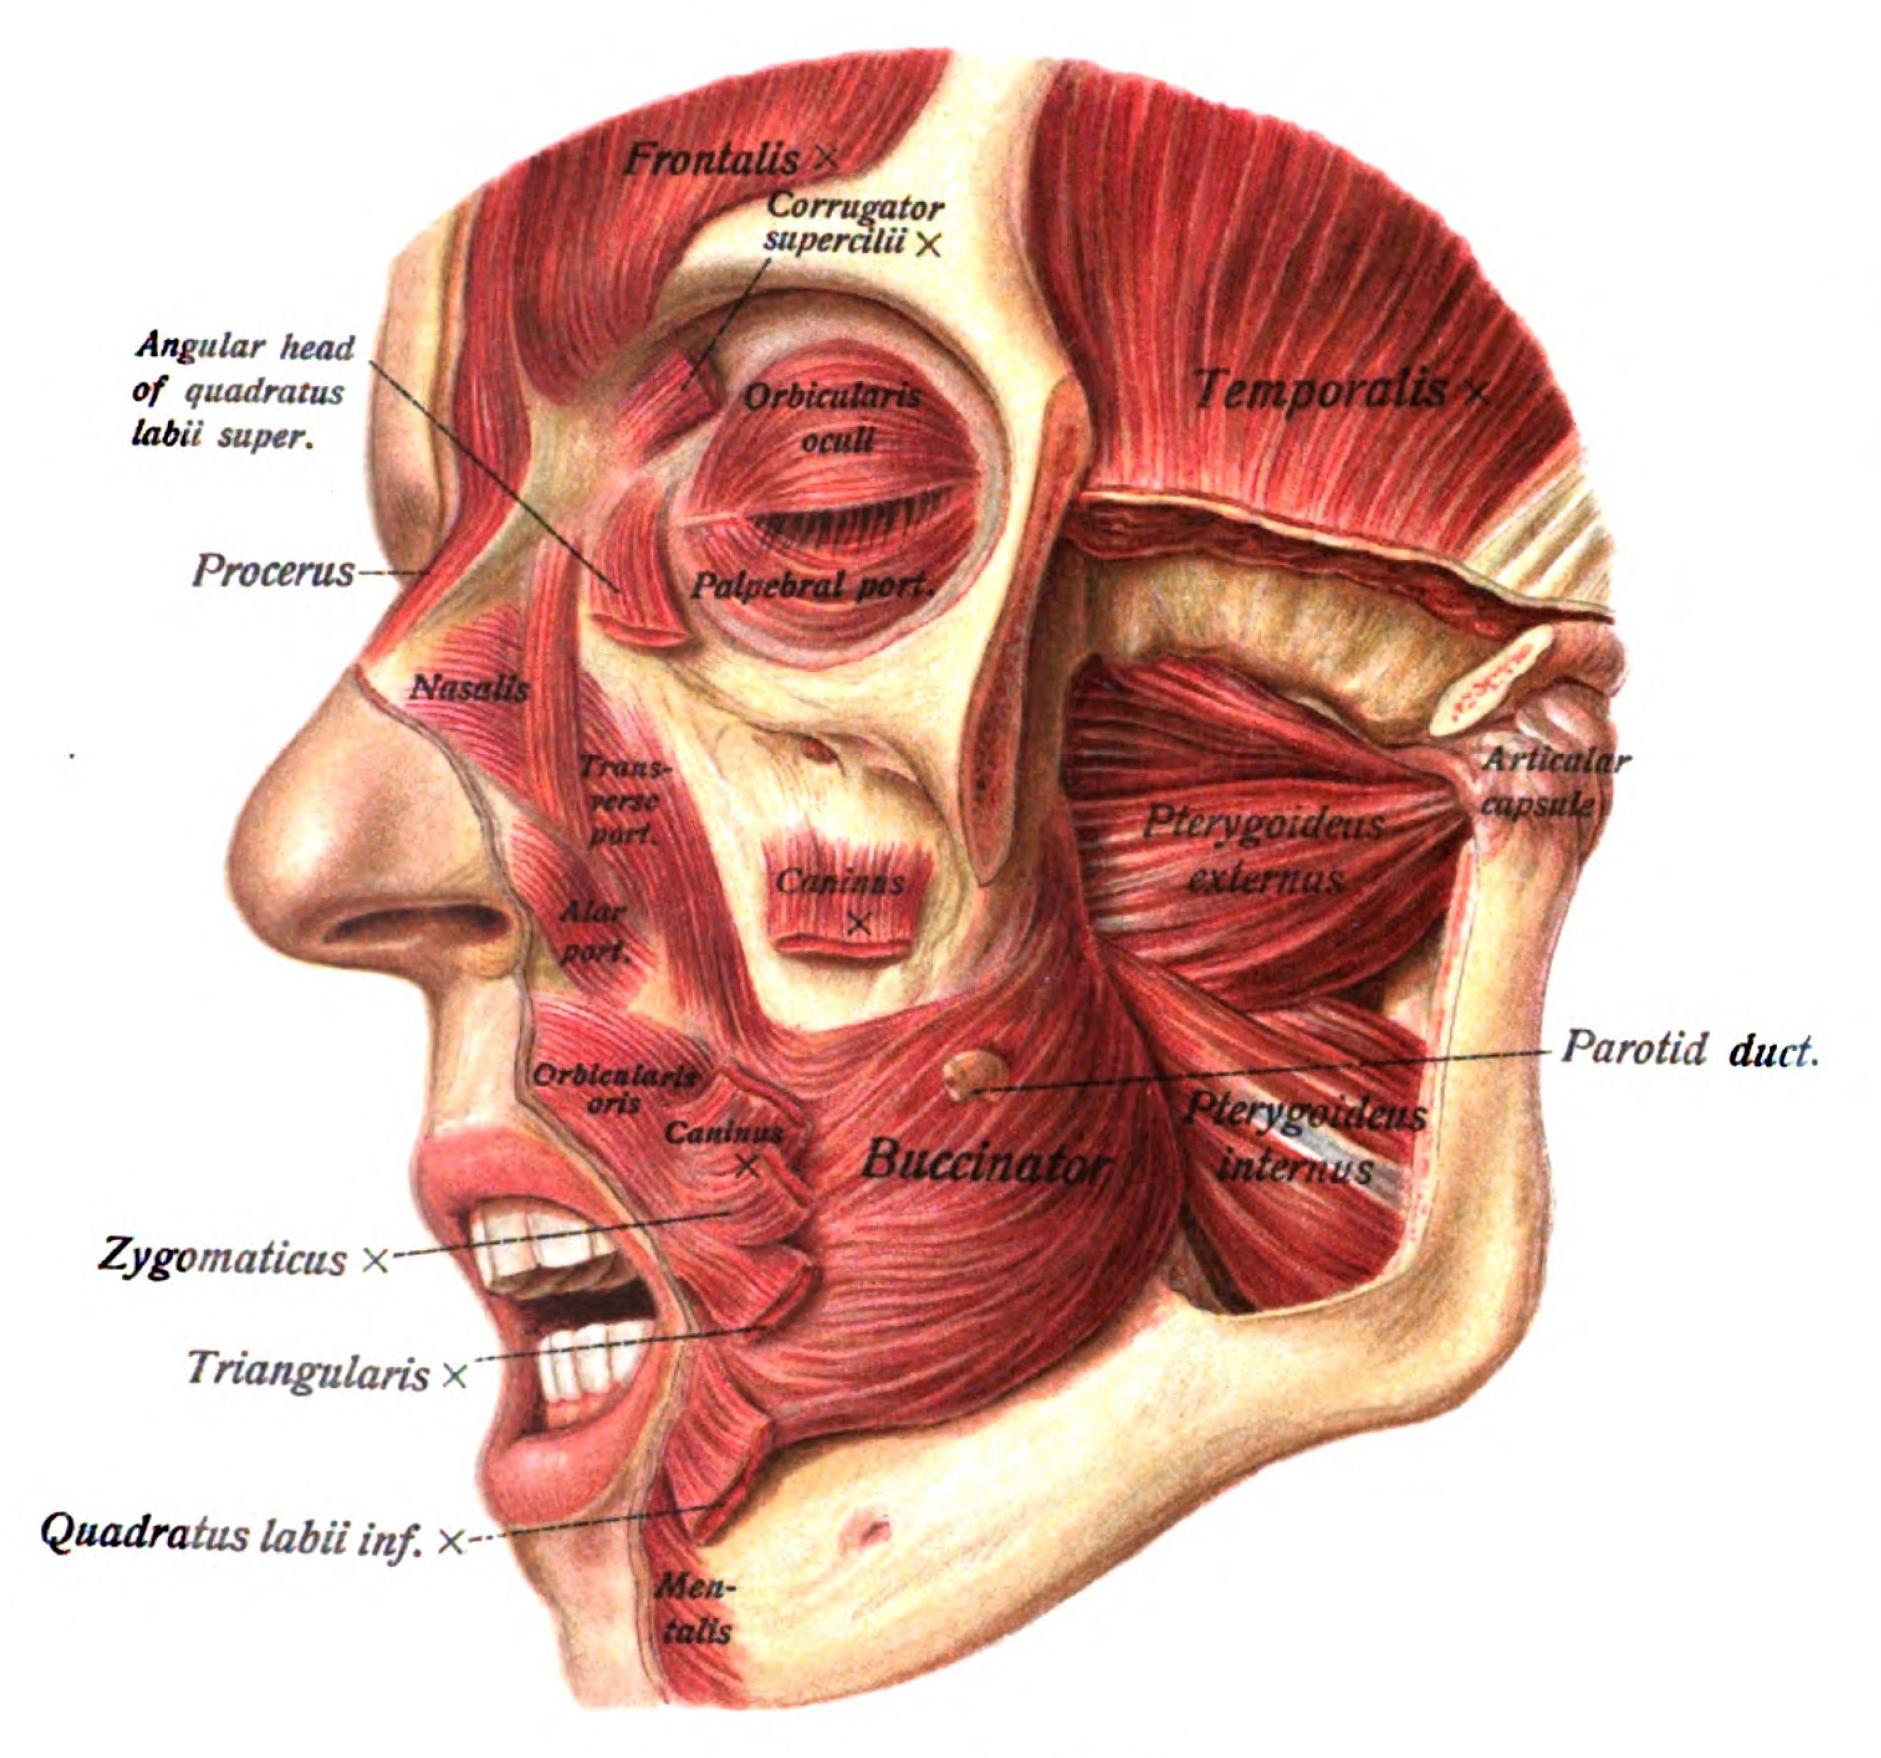 Pin de Chang woo Hahn en Human Anatomy | Pinterest